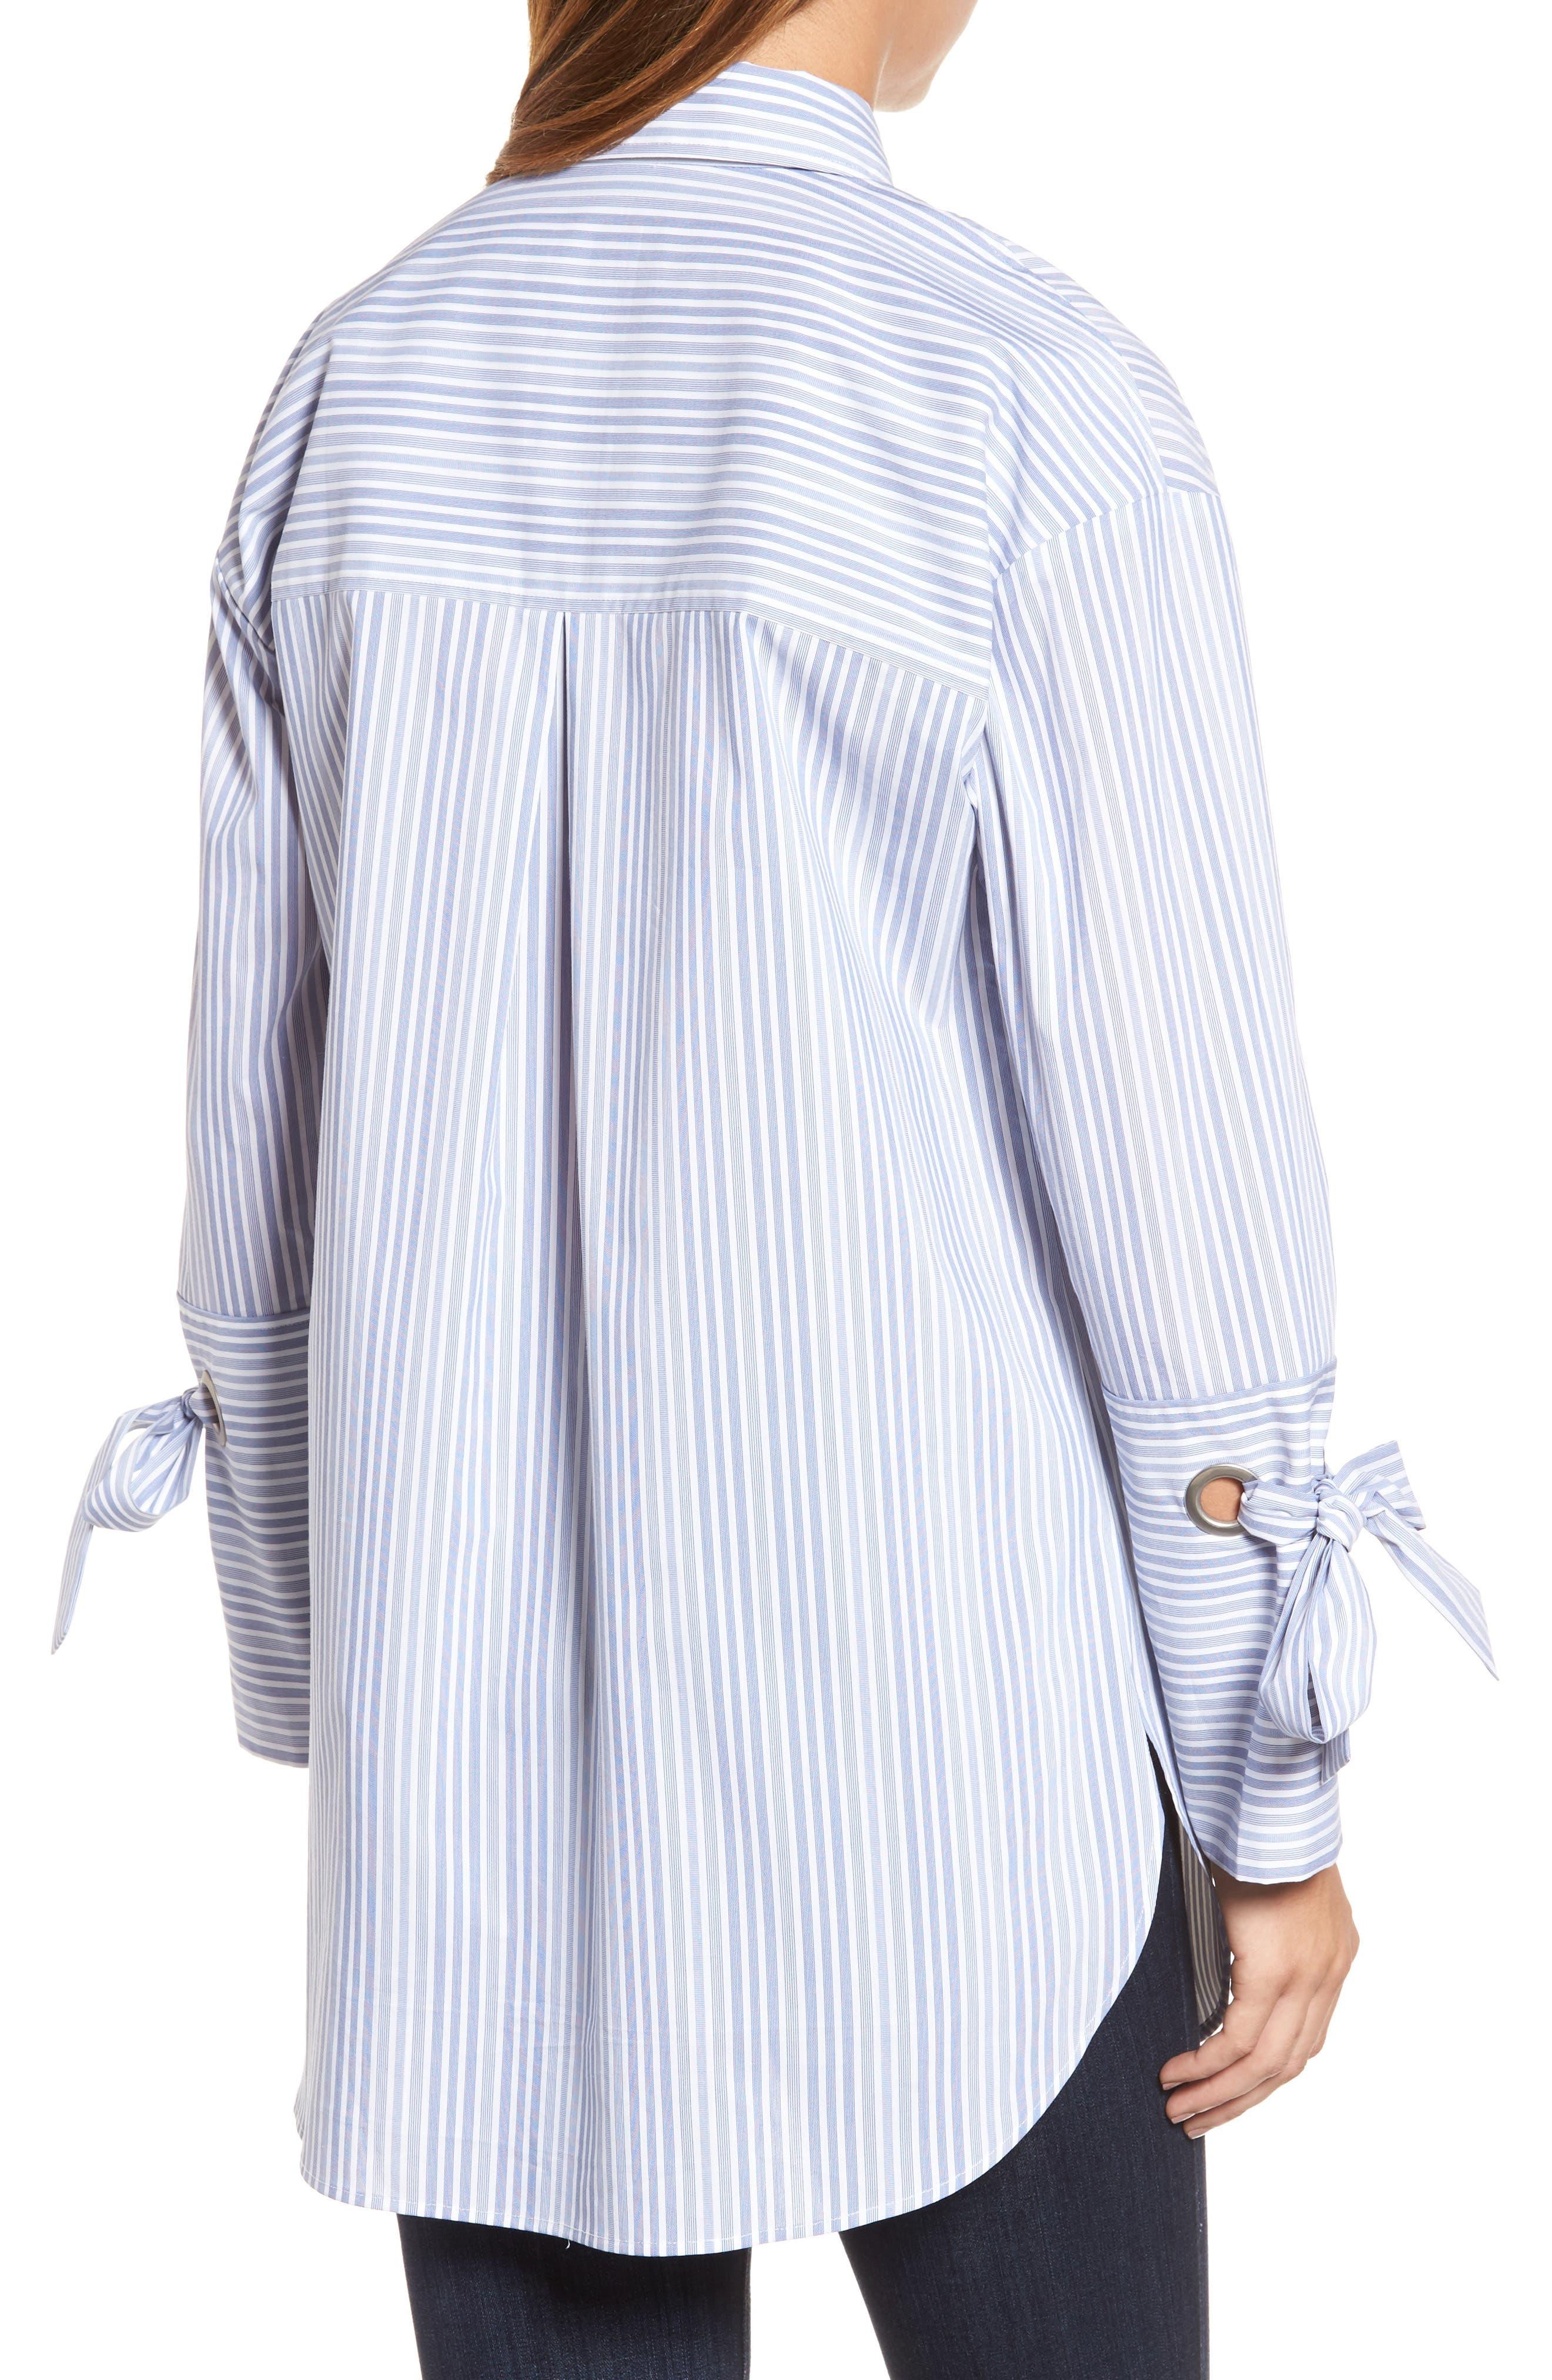 Pocket Detail Stripe Tunic Top,                             Alternate thumbnail 2, color,                             Blue- White Stripe